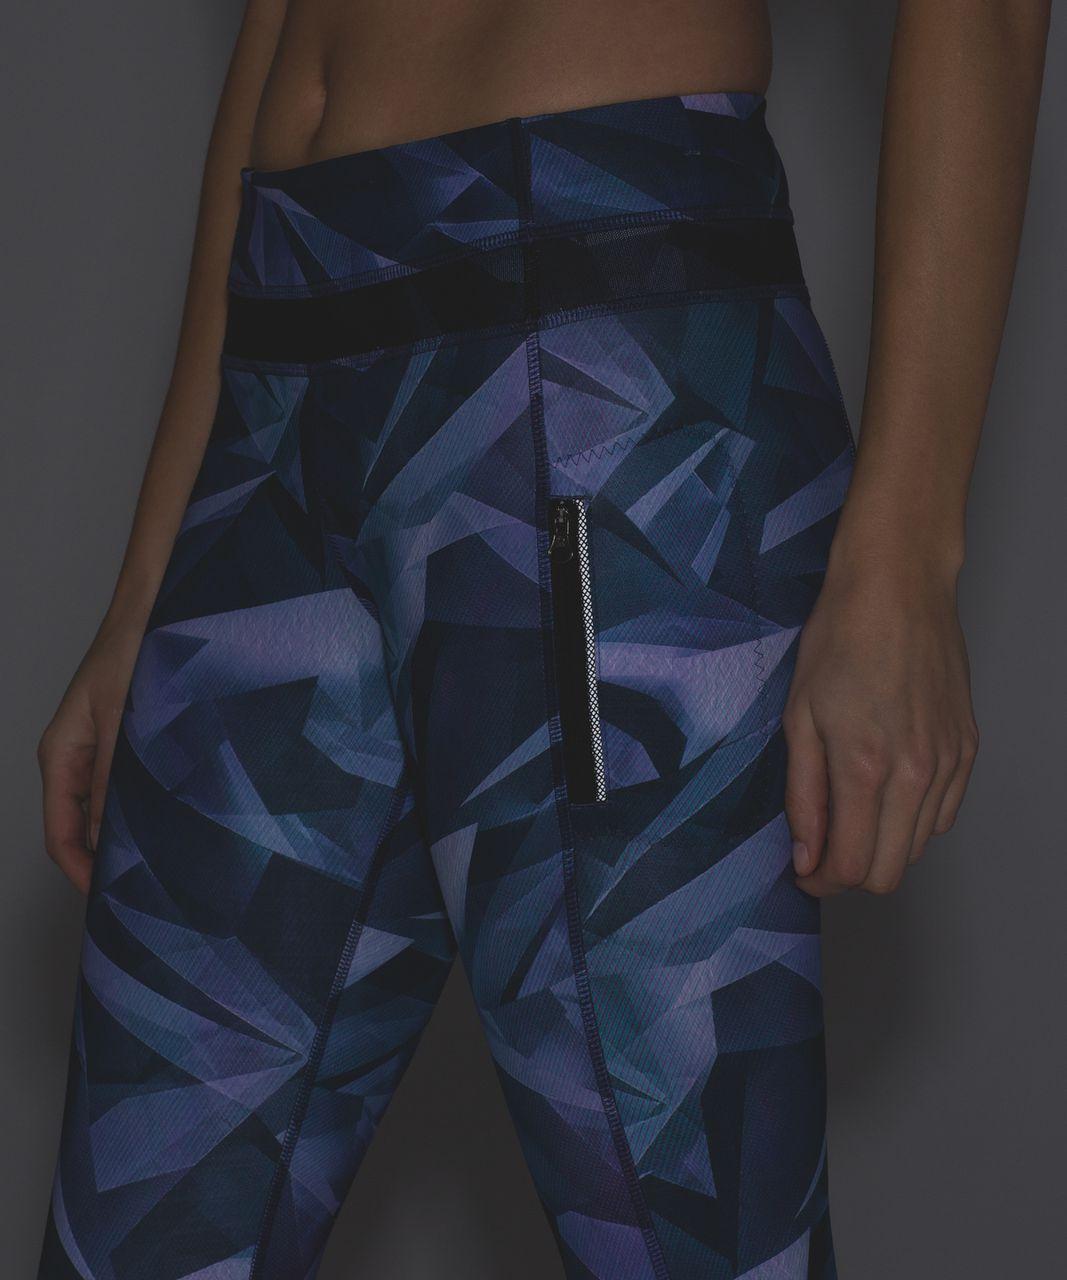 Lululemon Inspire Tight II (Mesh) - Pretty Prism Multi / Black